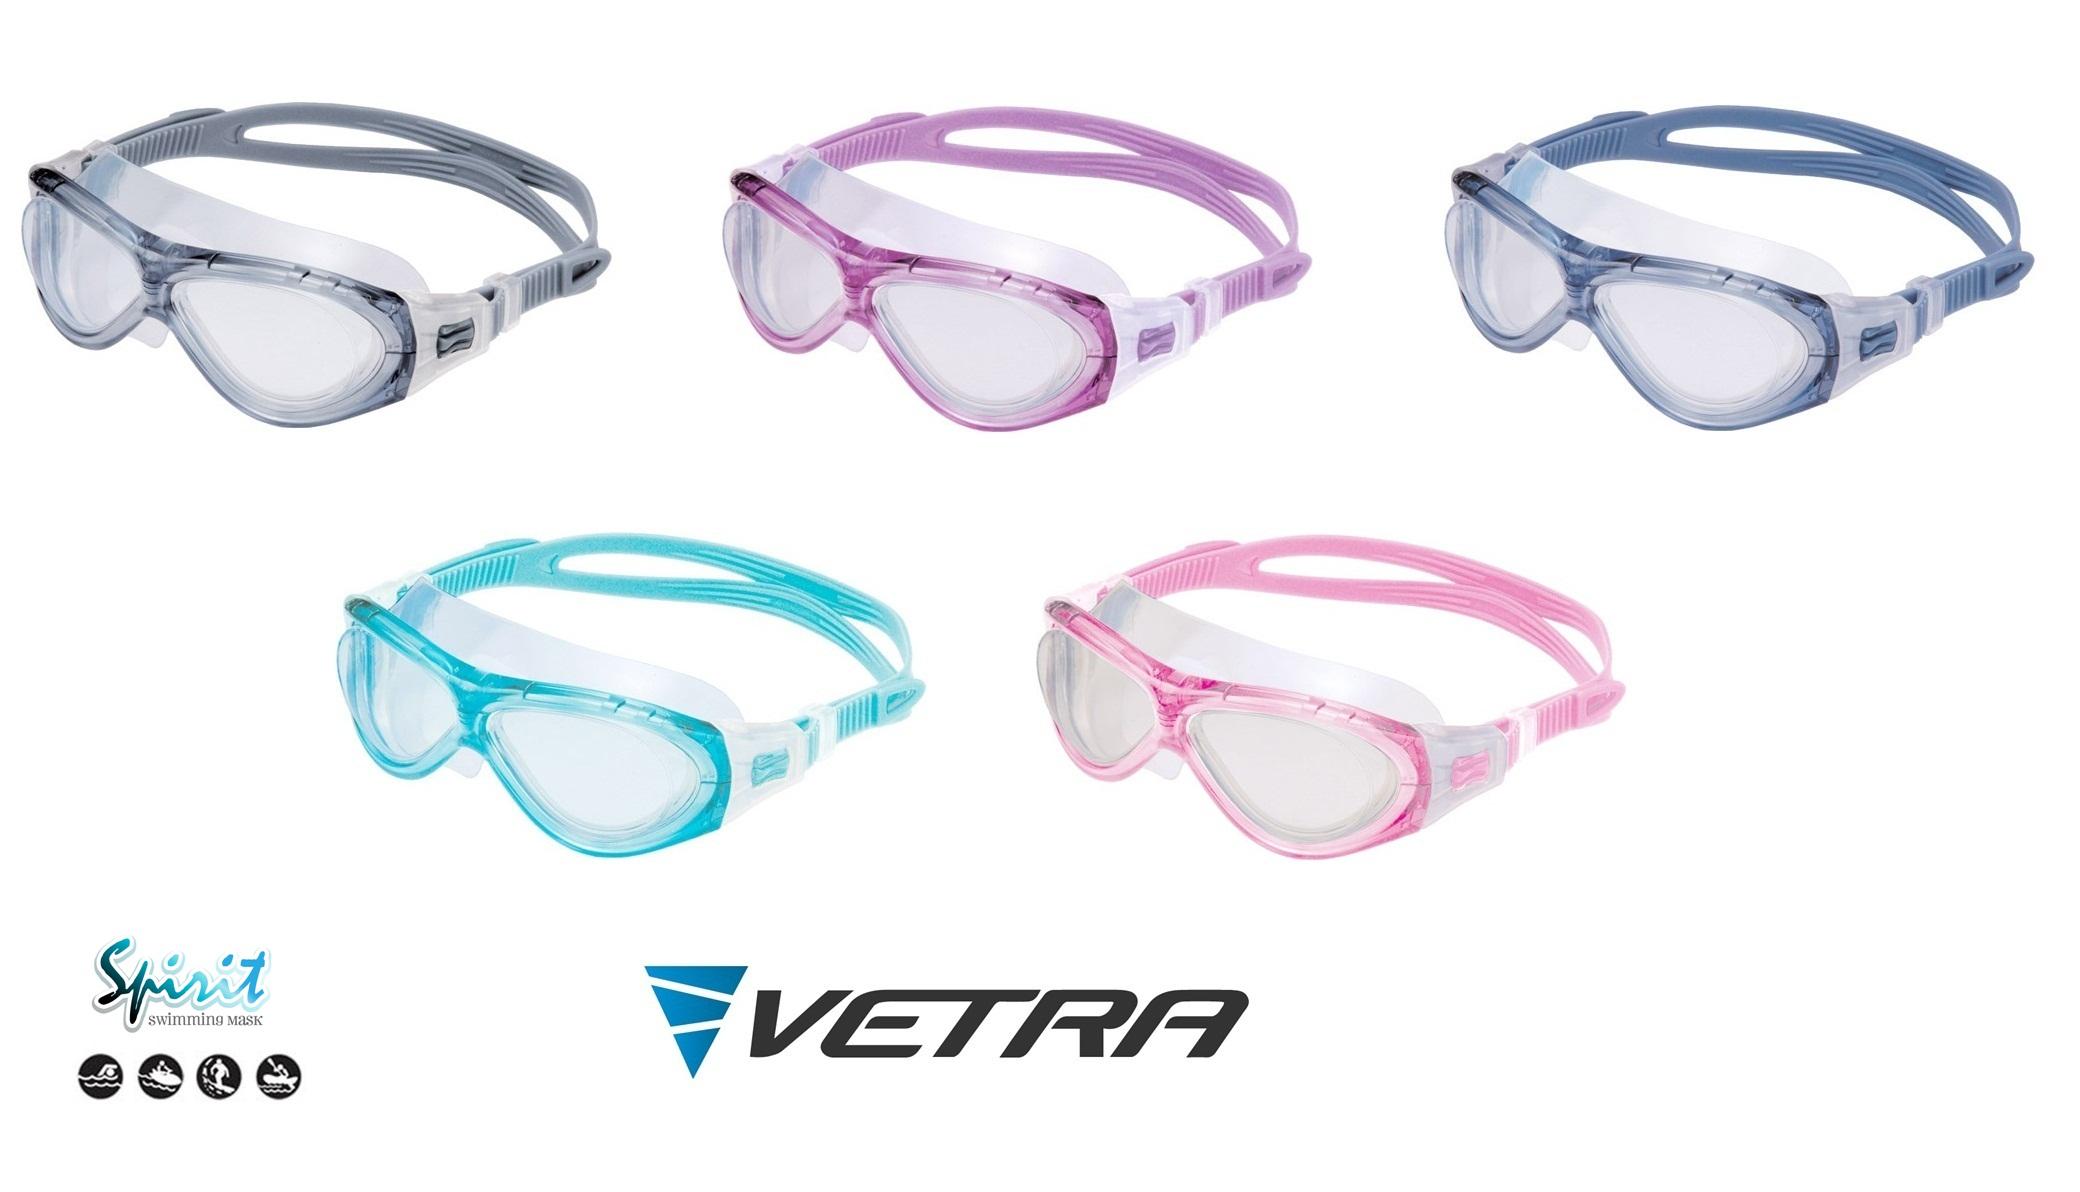 13032f4715 VETRA Swim Mask SPIRIT Goggles Anti-Fog UV Shilded Silicon Swimming Diving  New